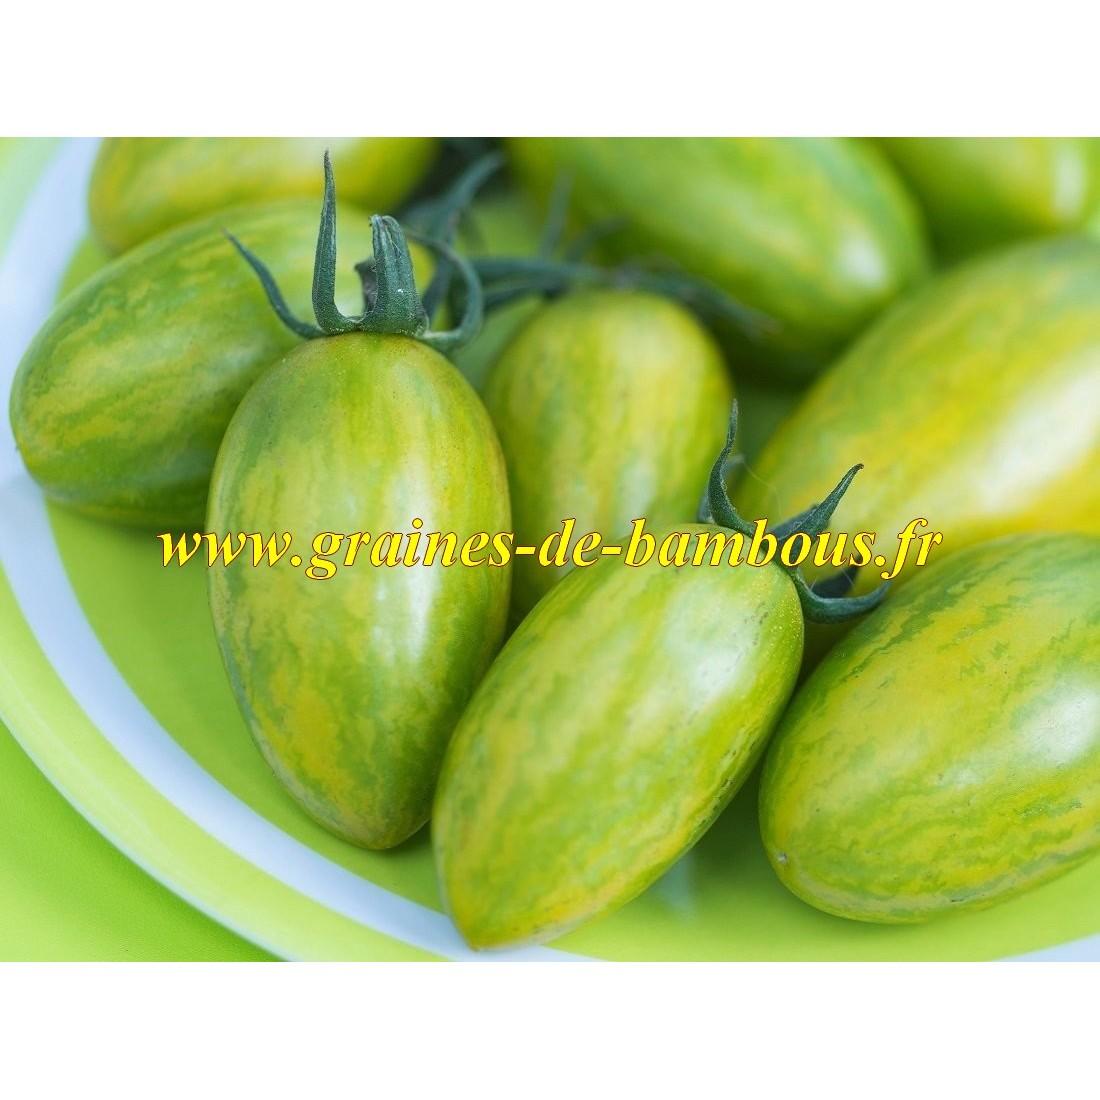 Green tiger tomate graines de bambous fr